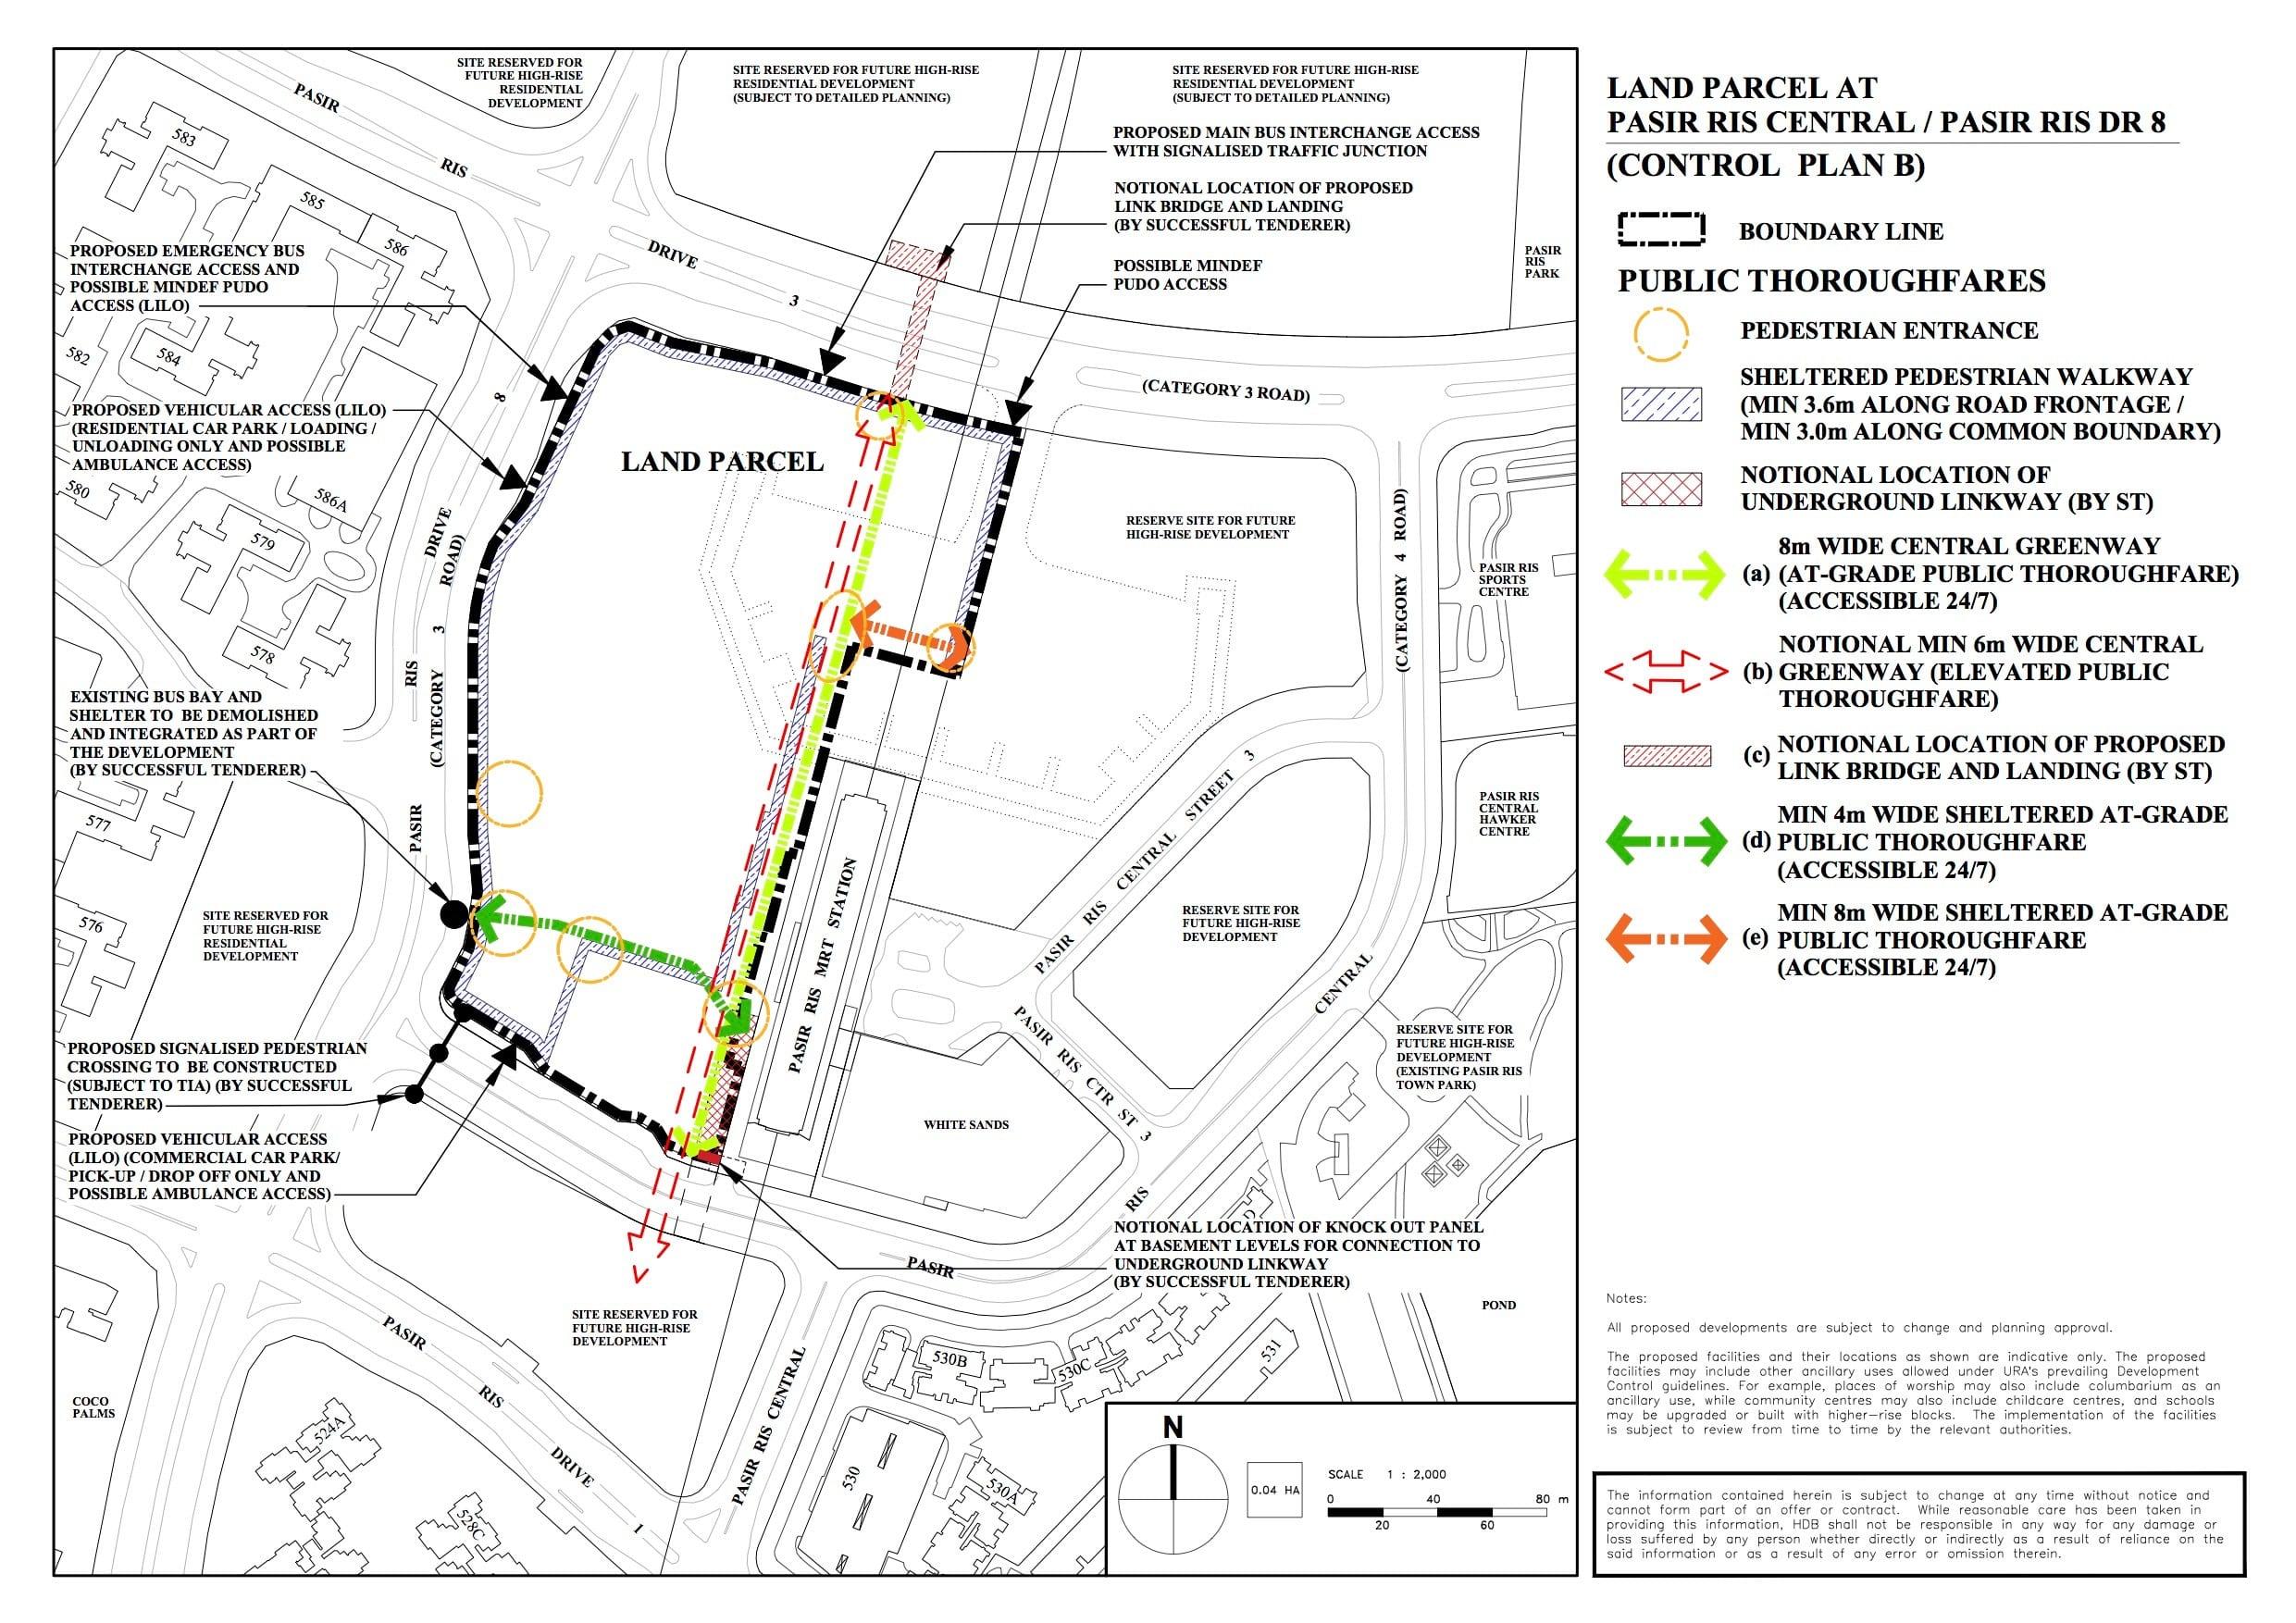 White Site Control Plan